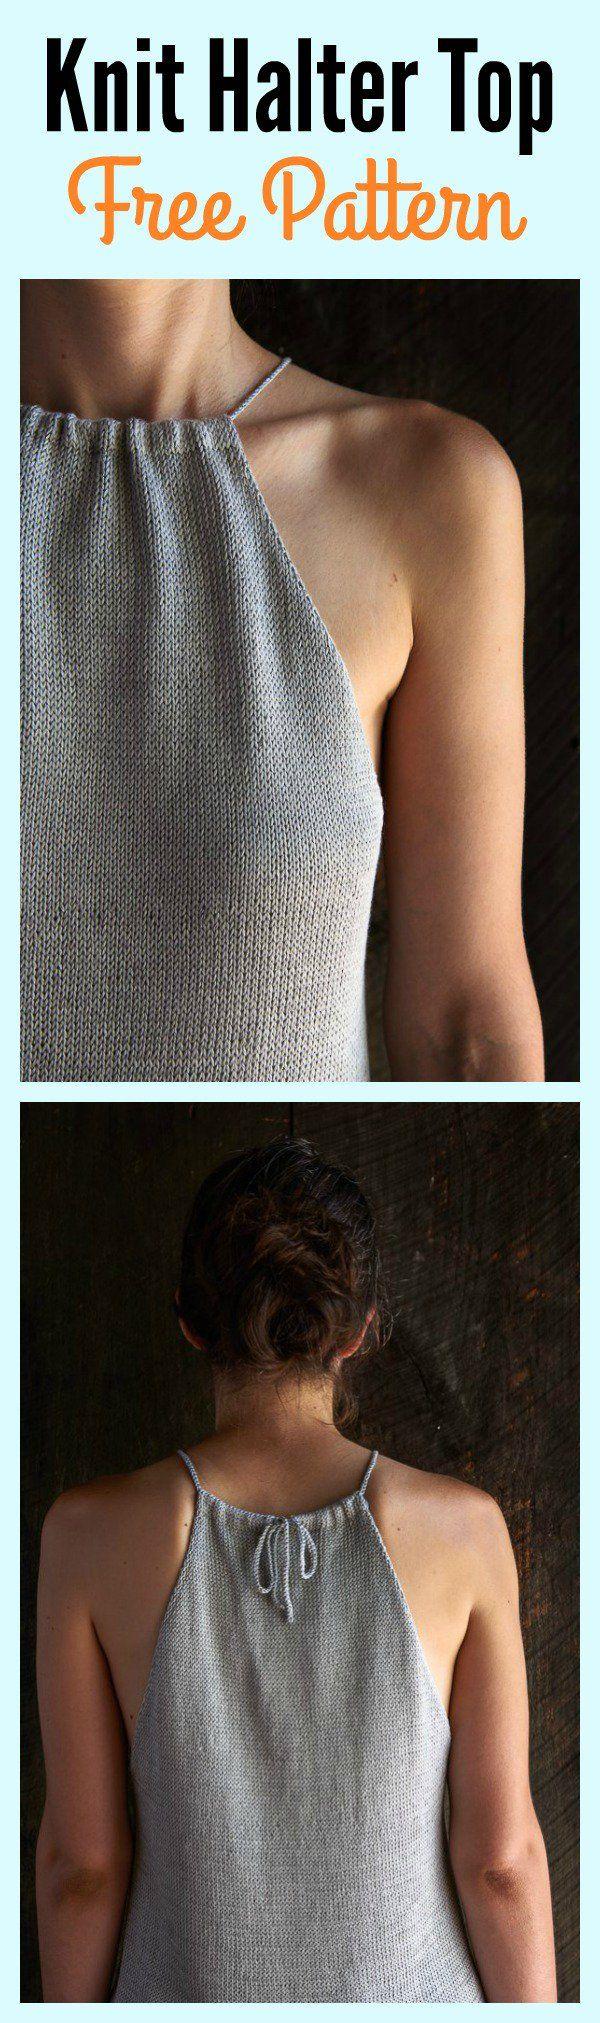 Knit Halter Top Free Pattern